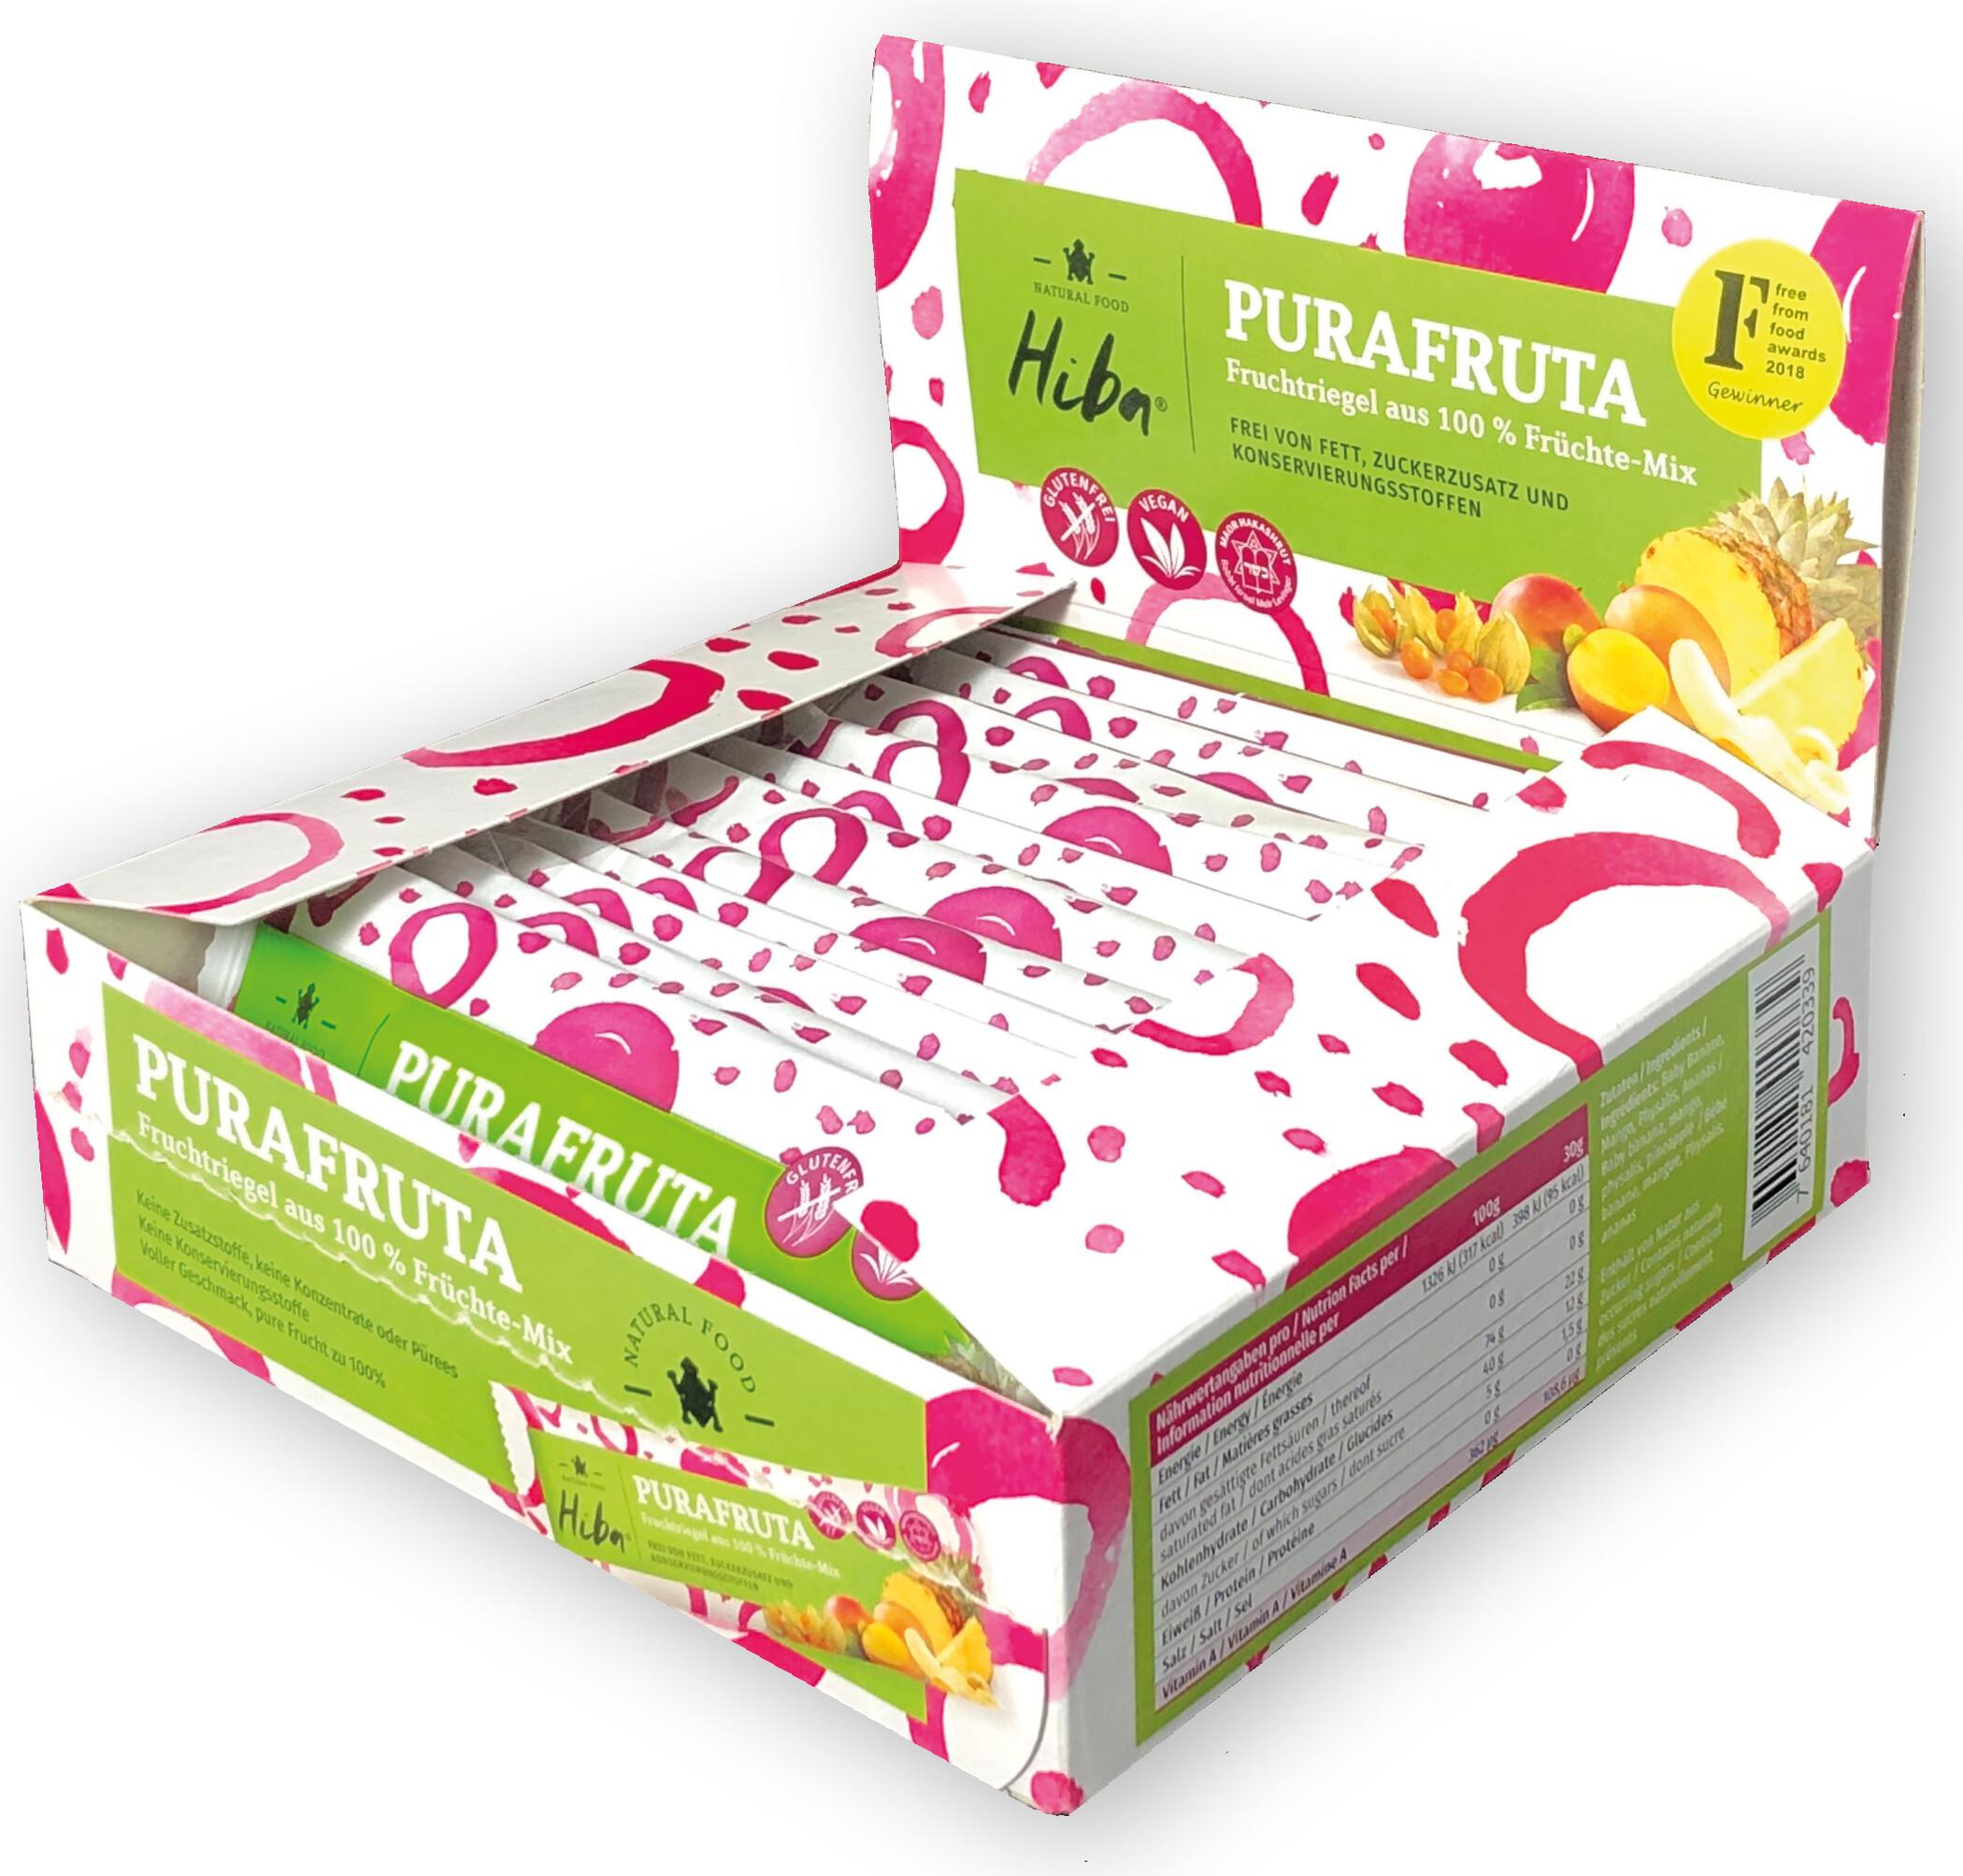 Hiba Purafruta Energy Bar Box 12x30g, Fruit Mix (2019) | Energy bar